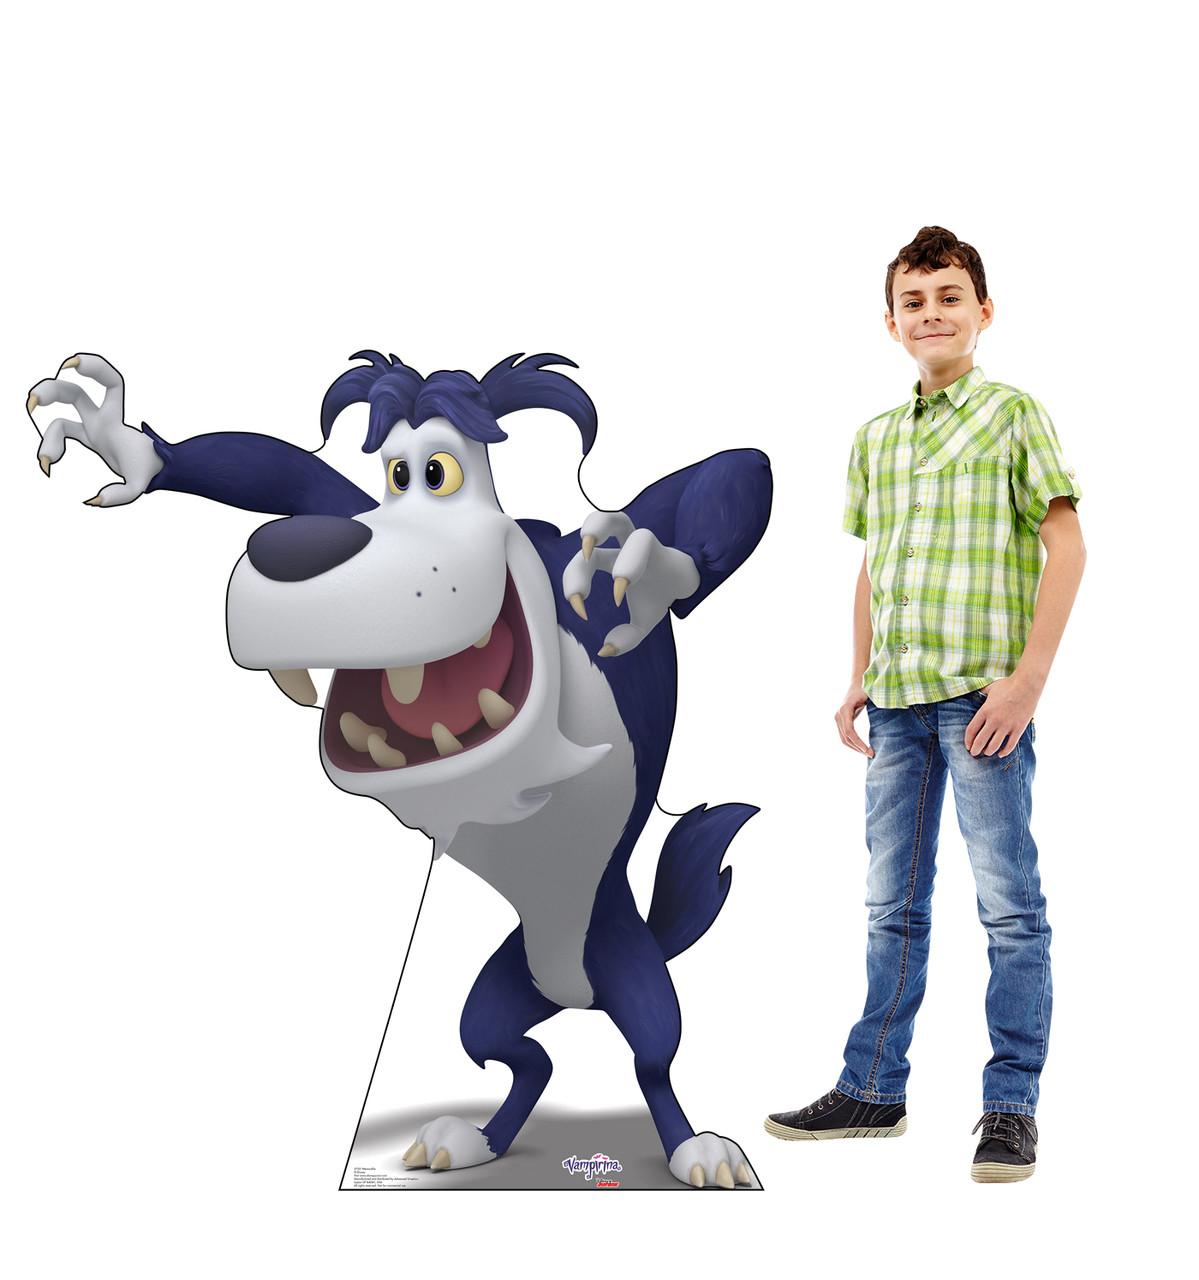 Werwolfie Life-size cardboard standee with model